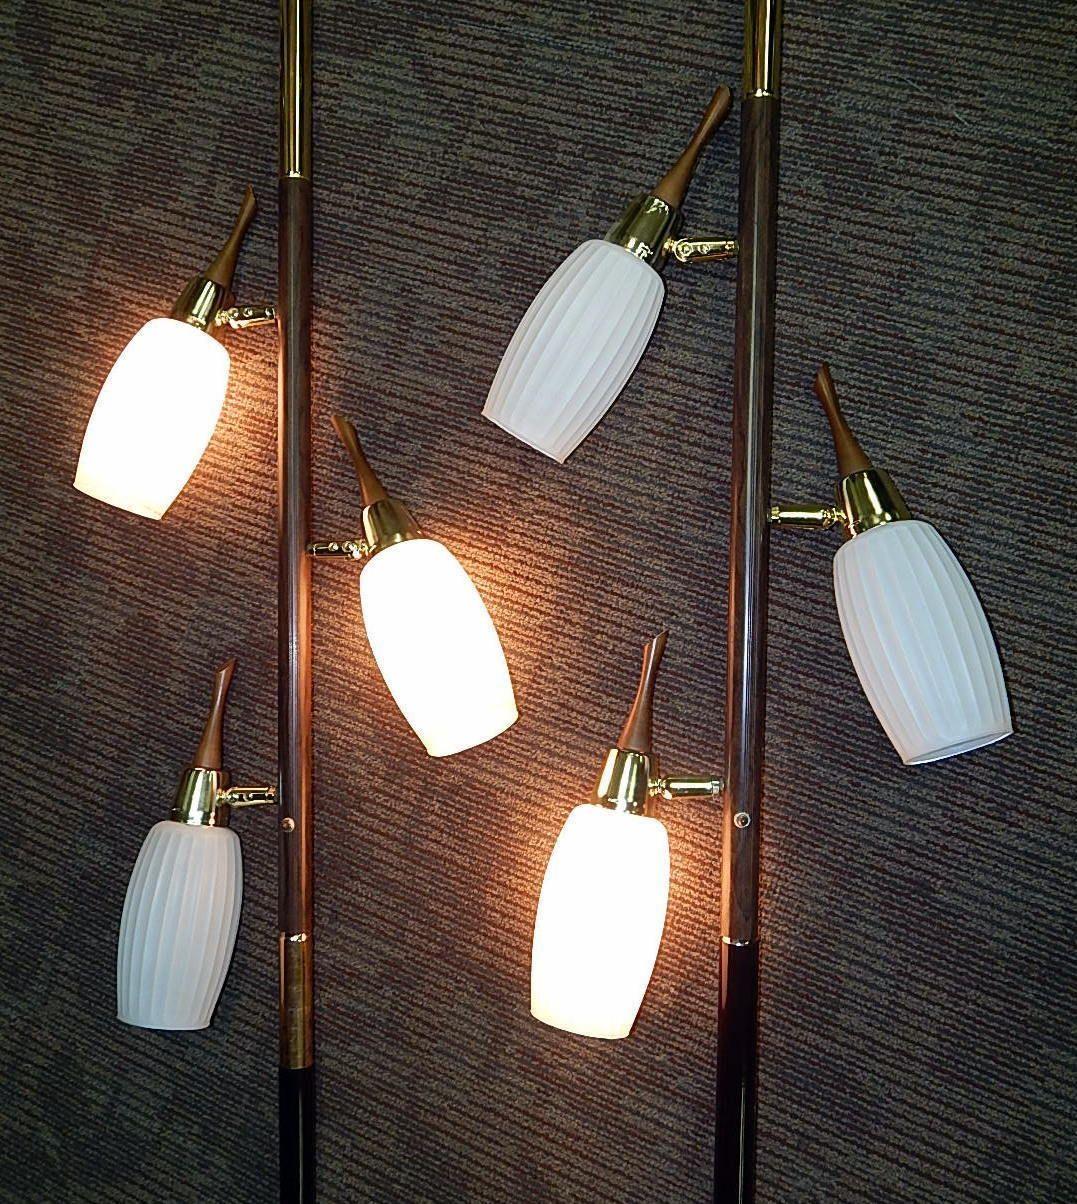 medium resolution of two mid century spring tension pole floor lamp light retro mcm modern ebay electrical wiring